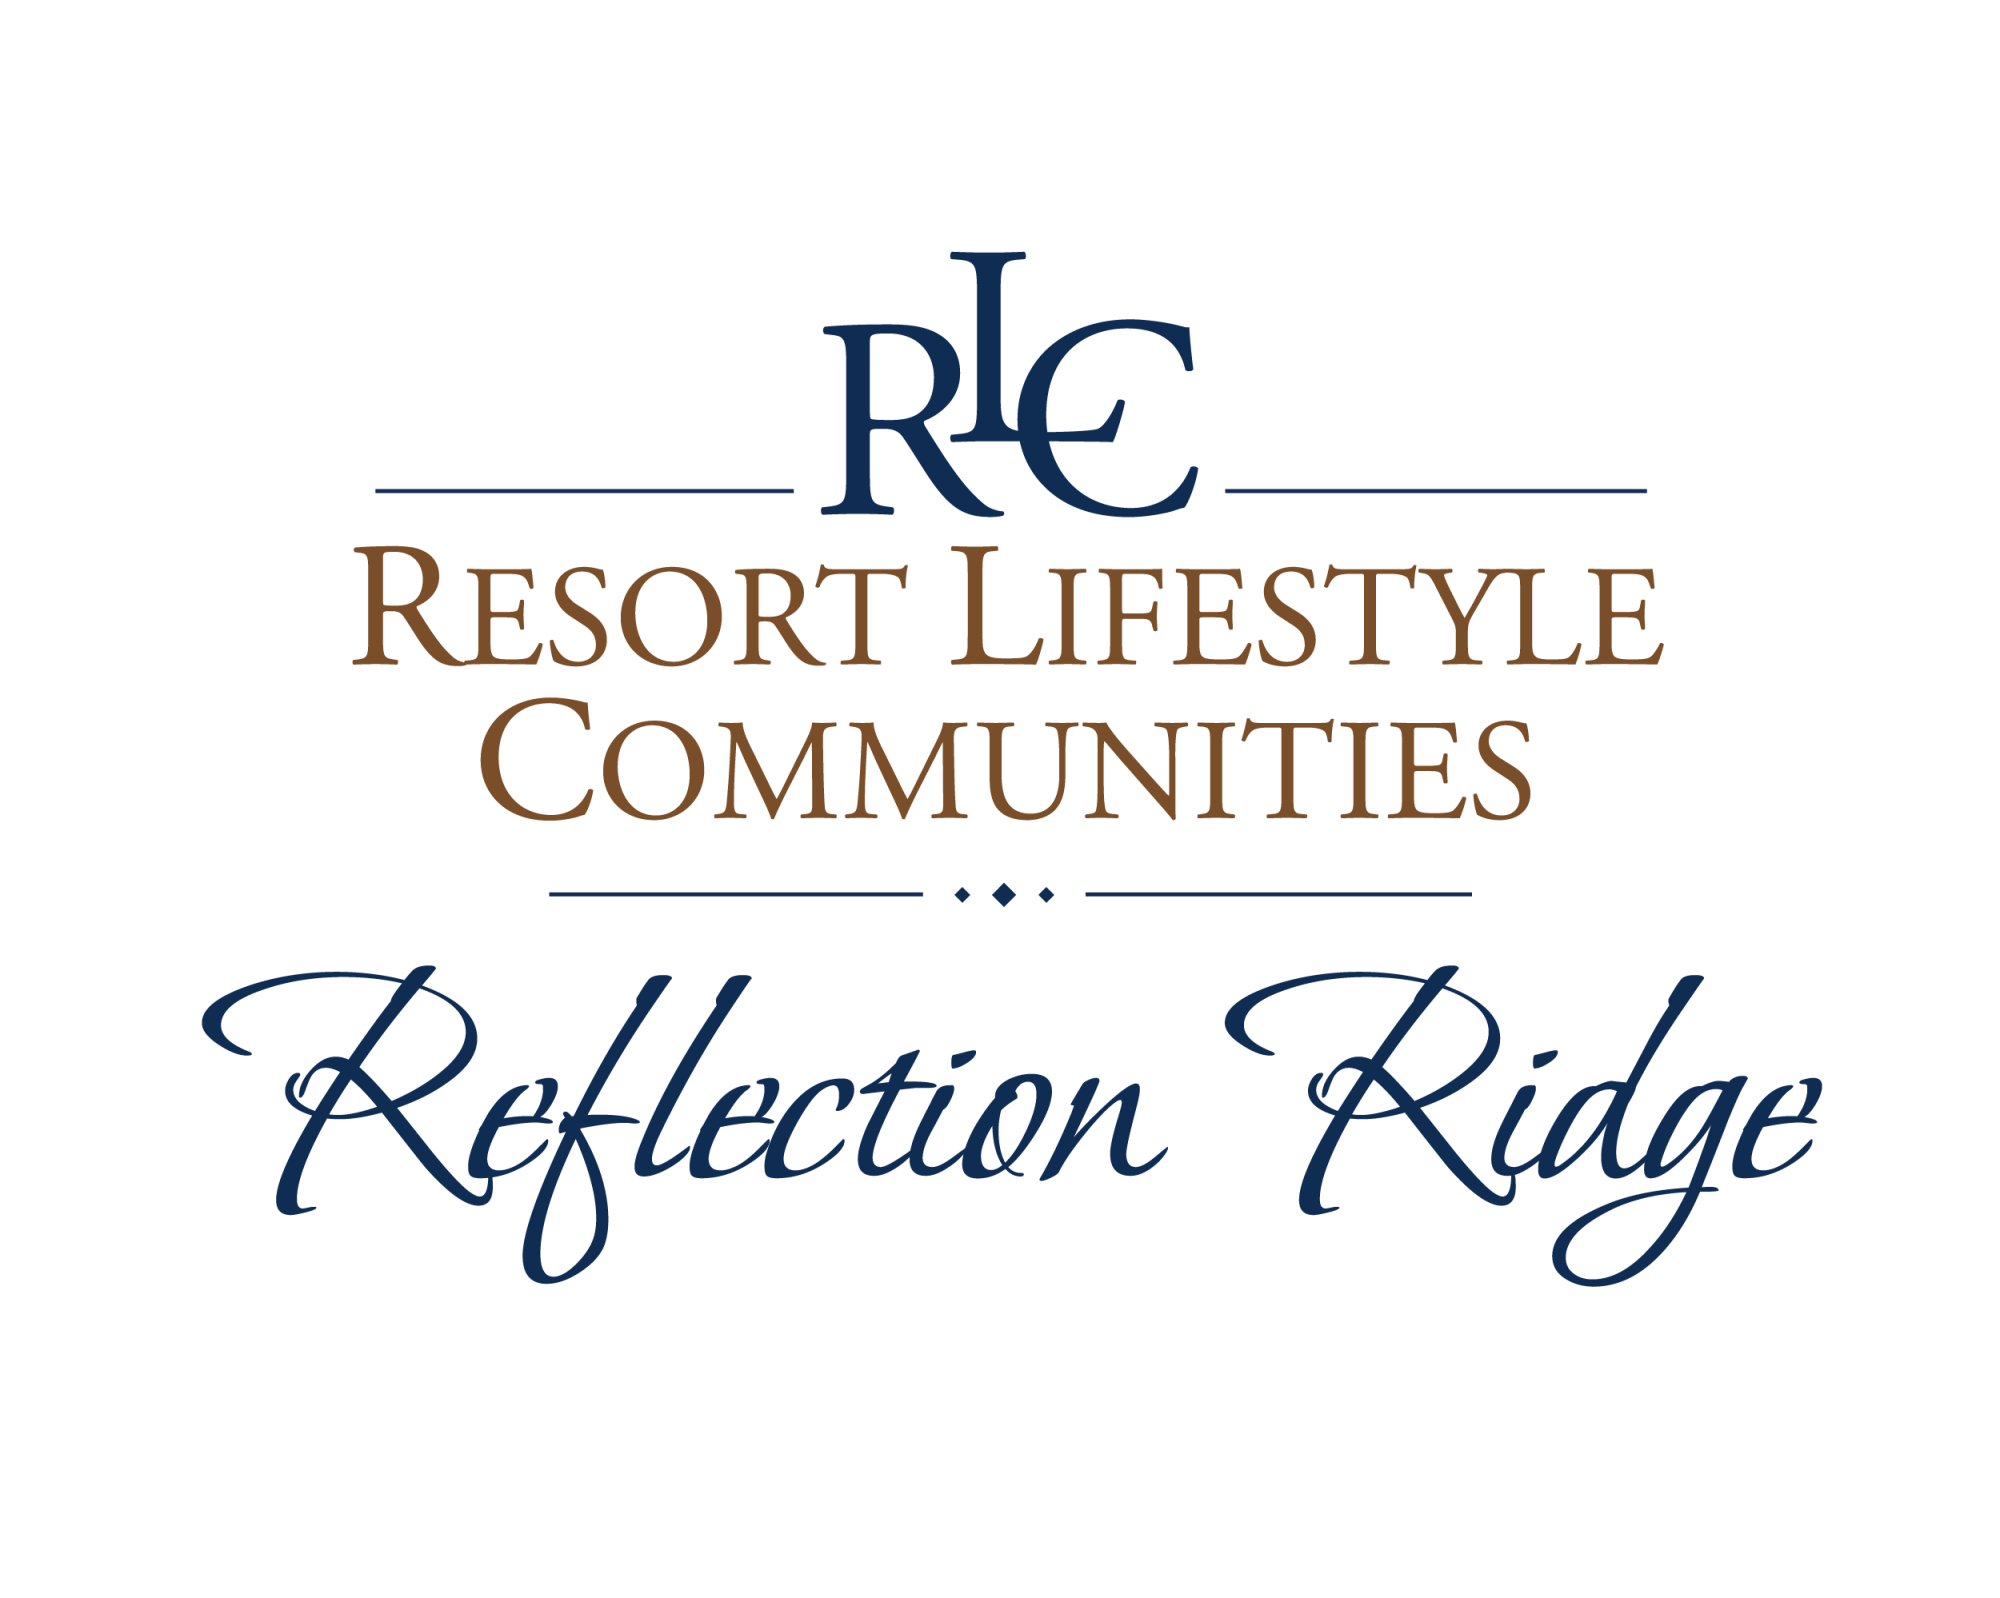 resort lifestyle communities reflection ridge retirement community